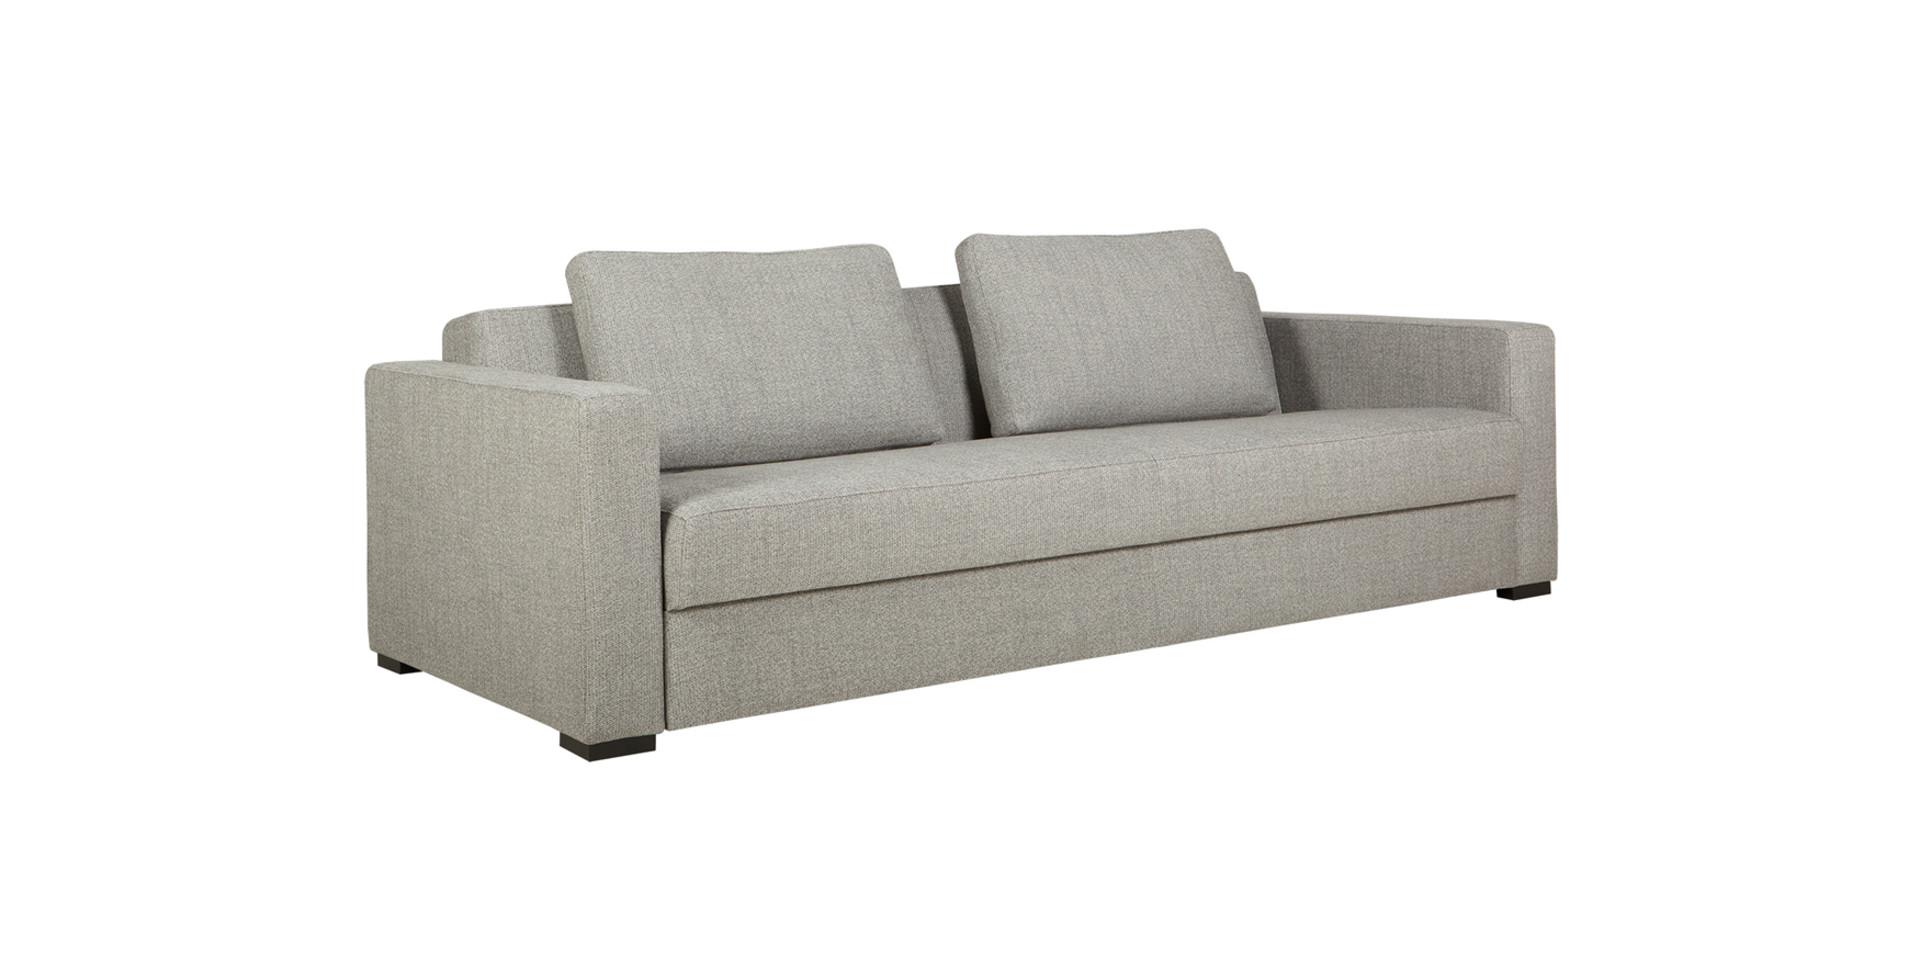 sits-puk-canape-convertible-sofa_bed_origin51_light_grey_2